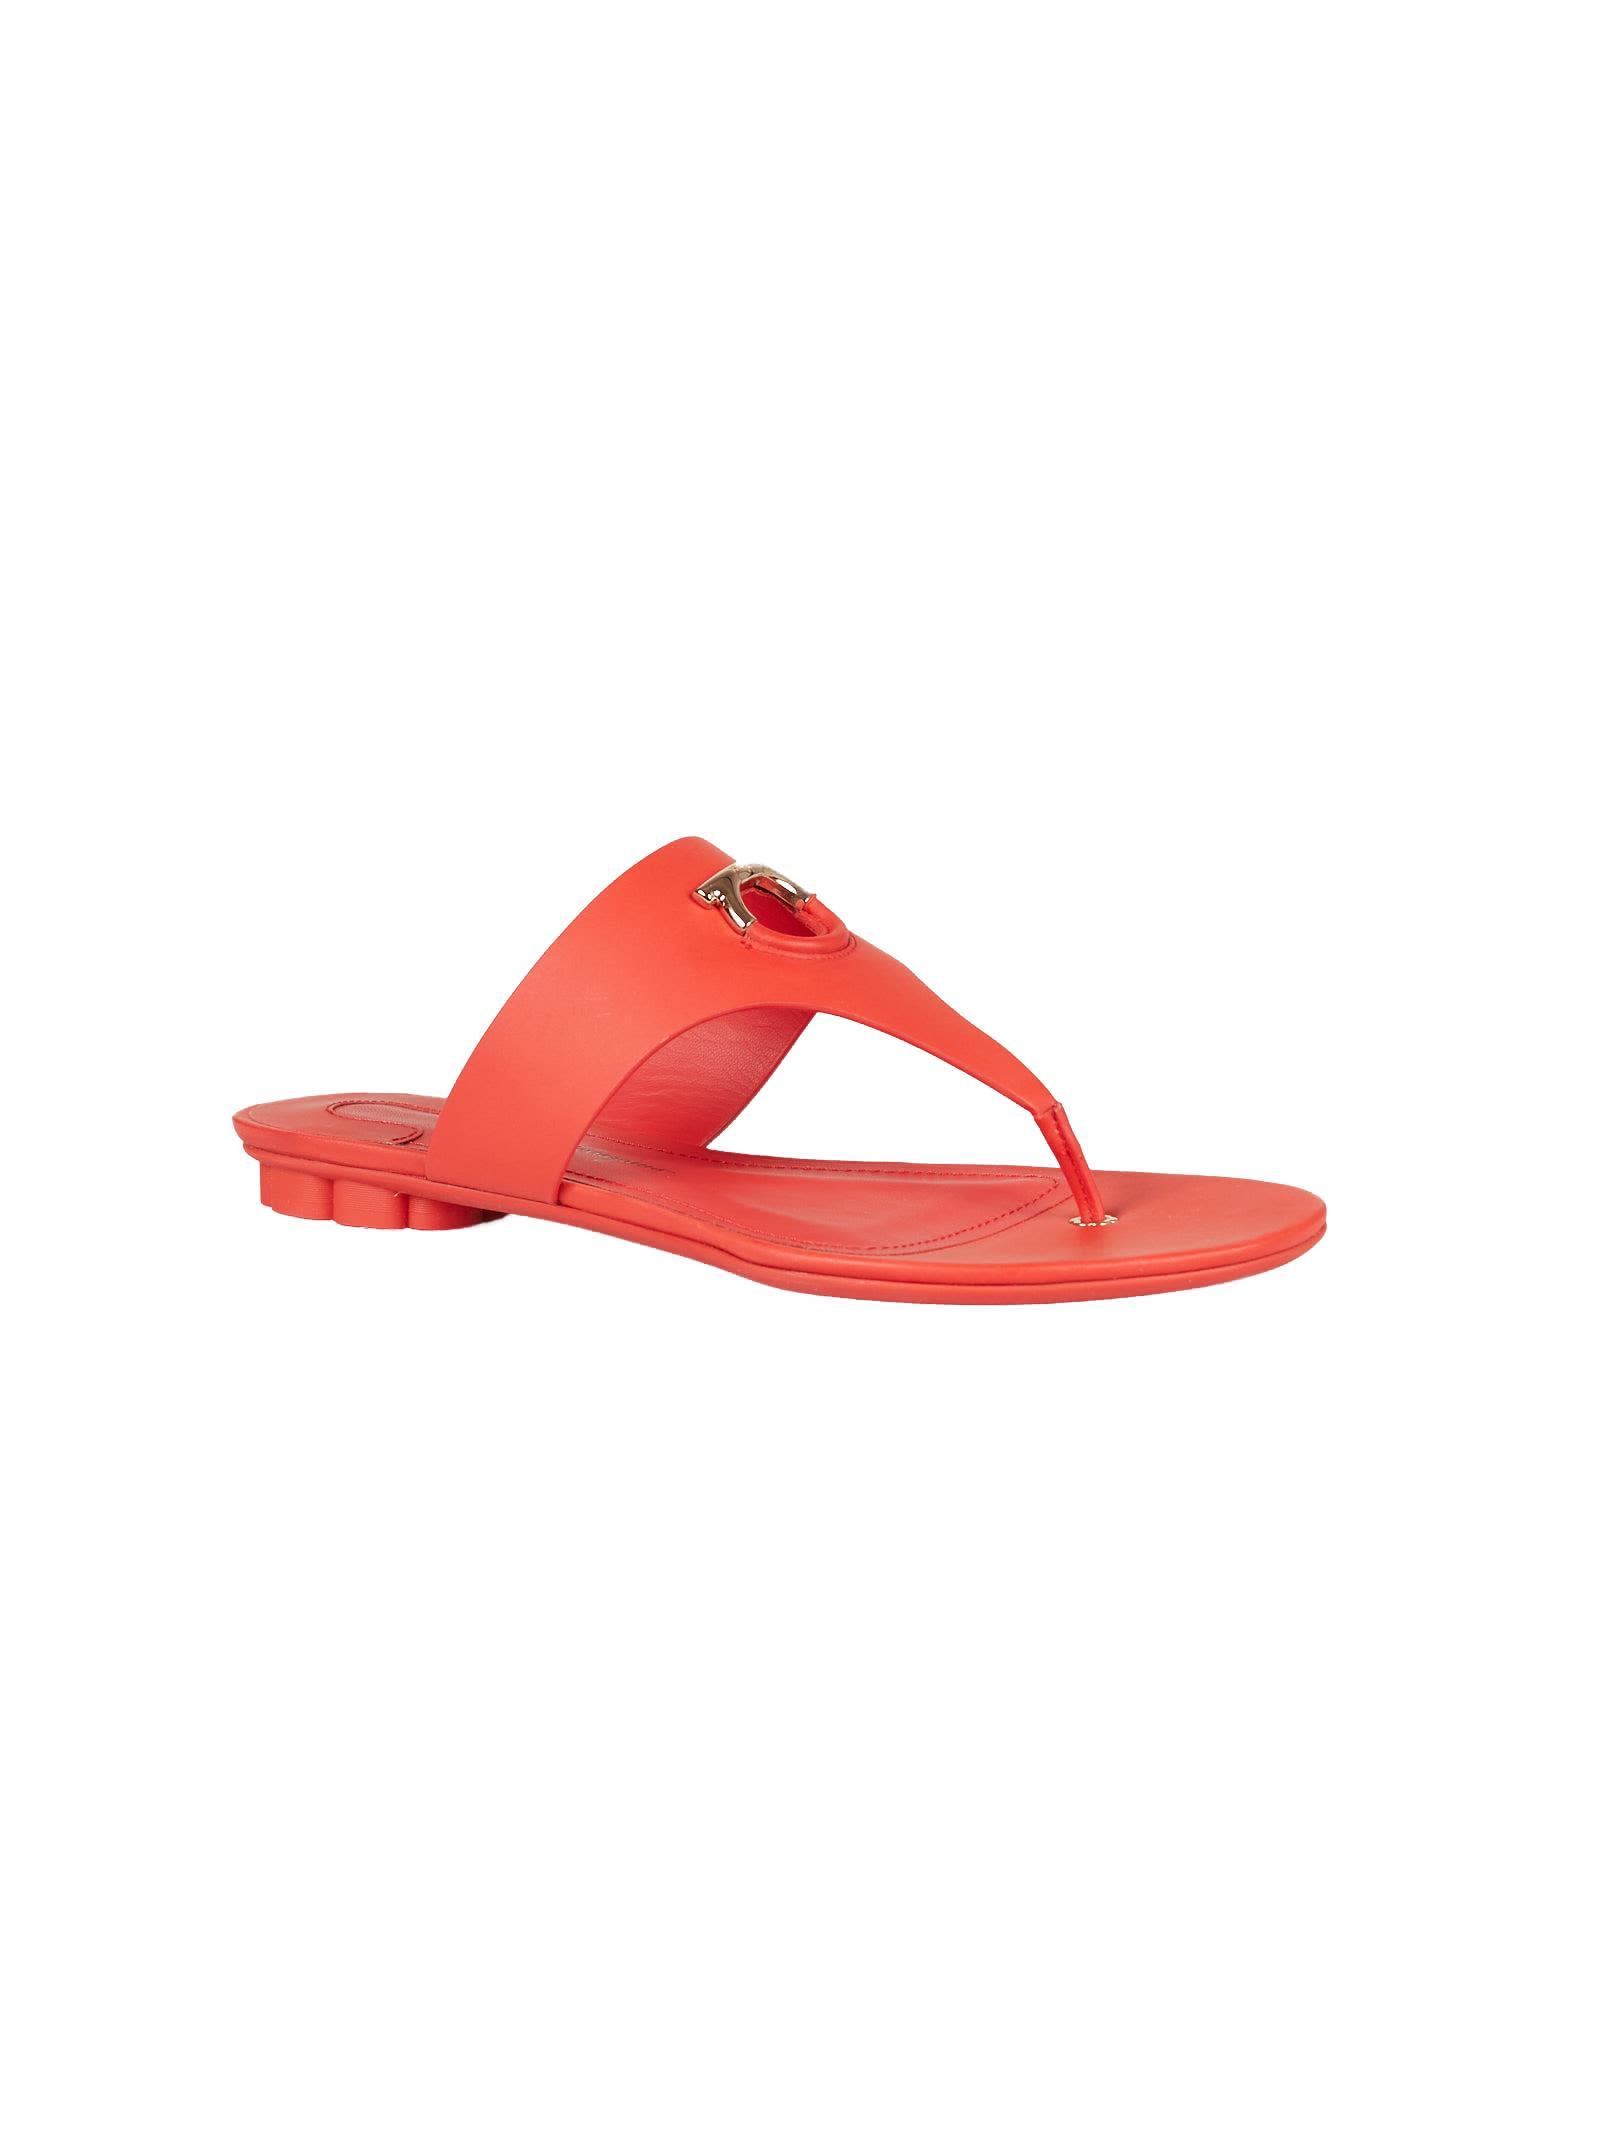 9616b2b5cc9 Salvatore ferragamo enfola flat sandals arancio salvatore ferragamo enfola  flat sandals arancio jpg 1600x2136 Salvatore ferragamo